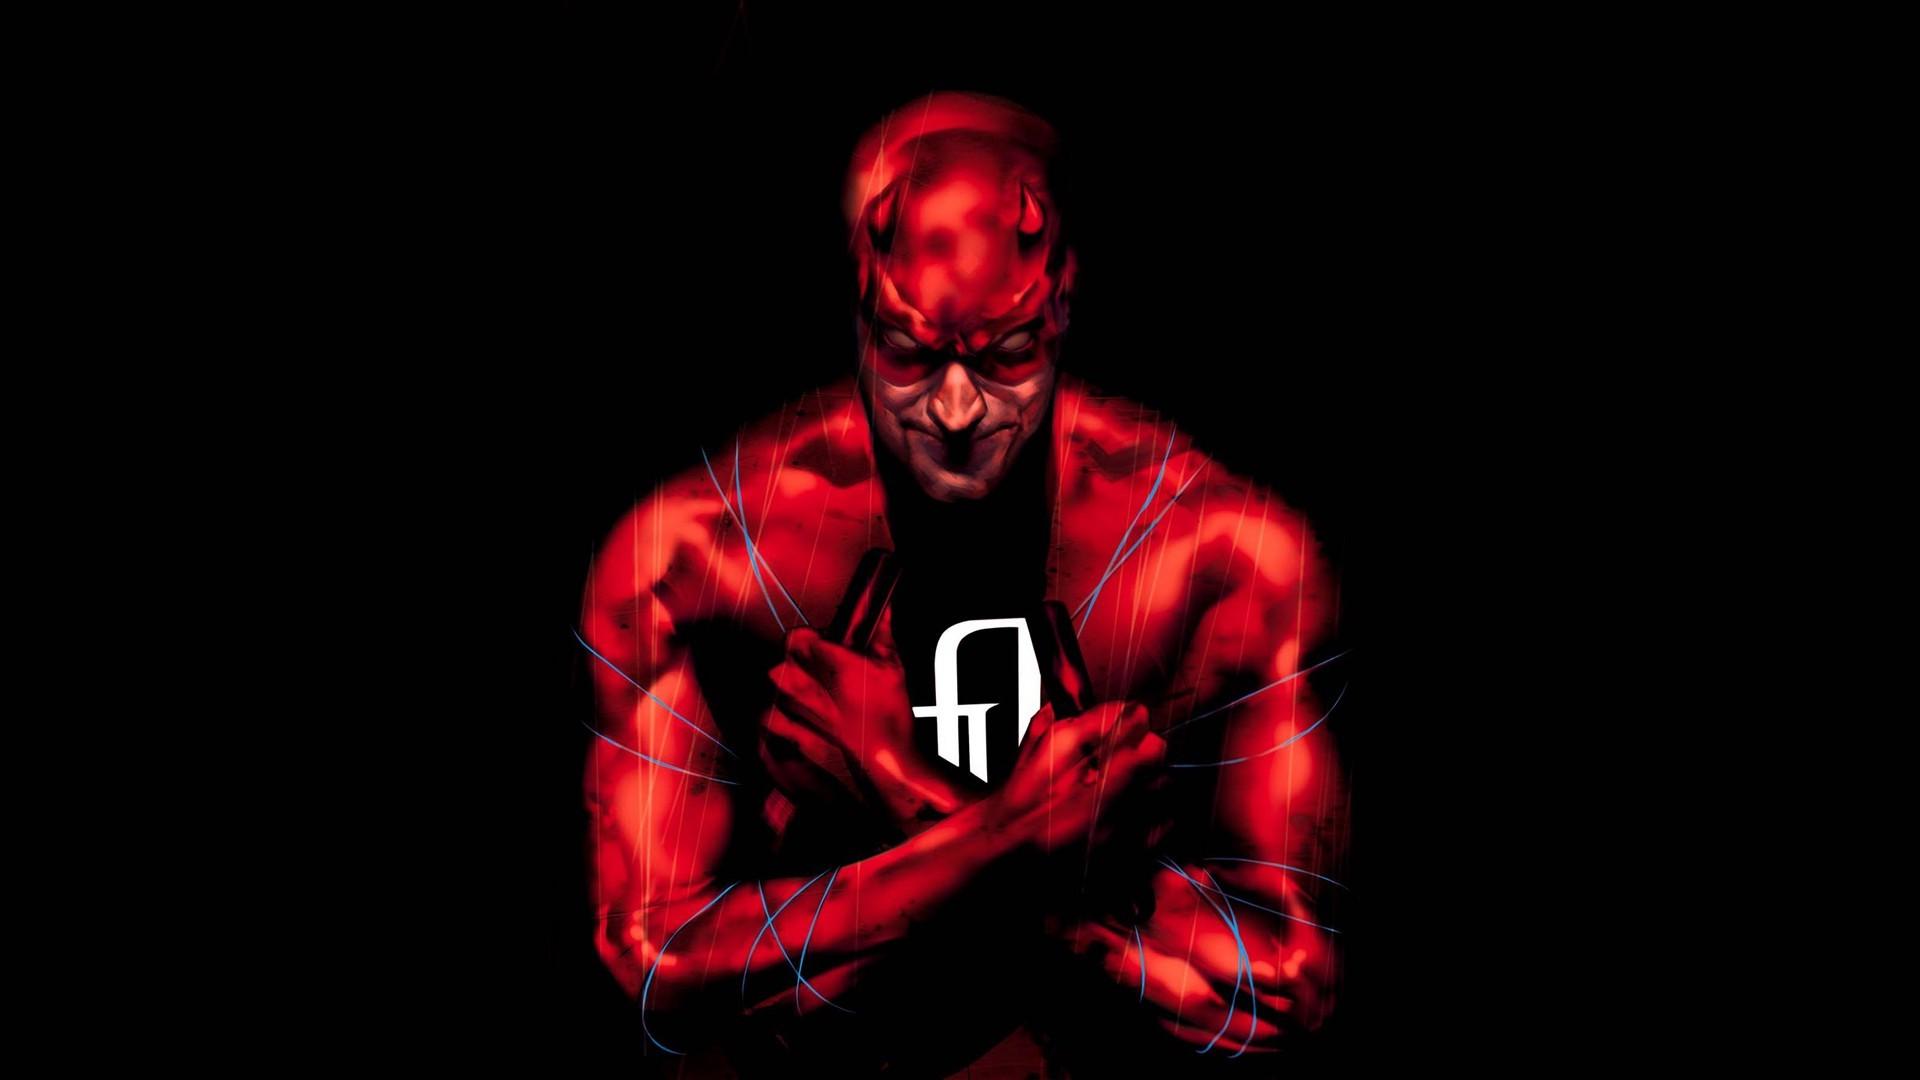 1920x1080 Px Comics Daredevil